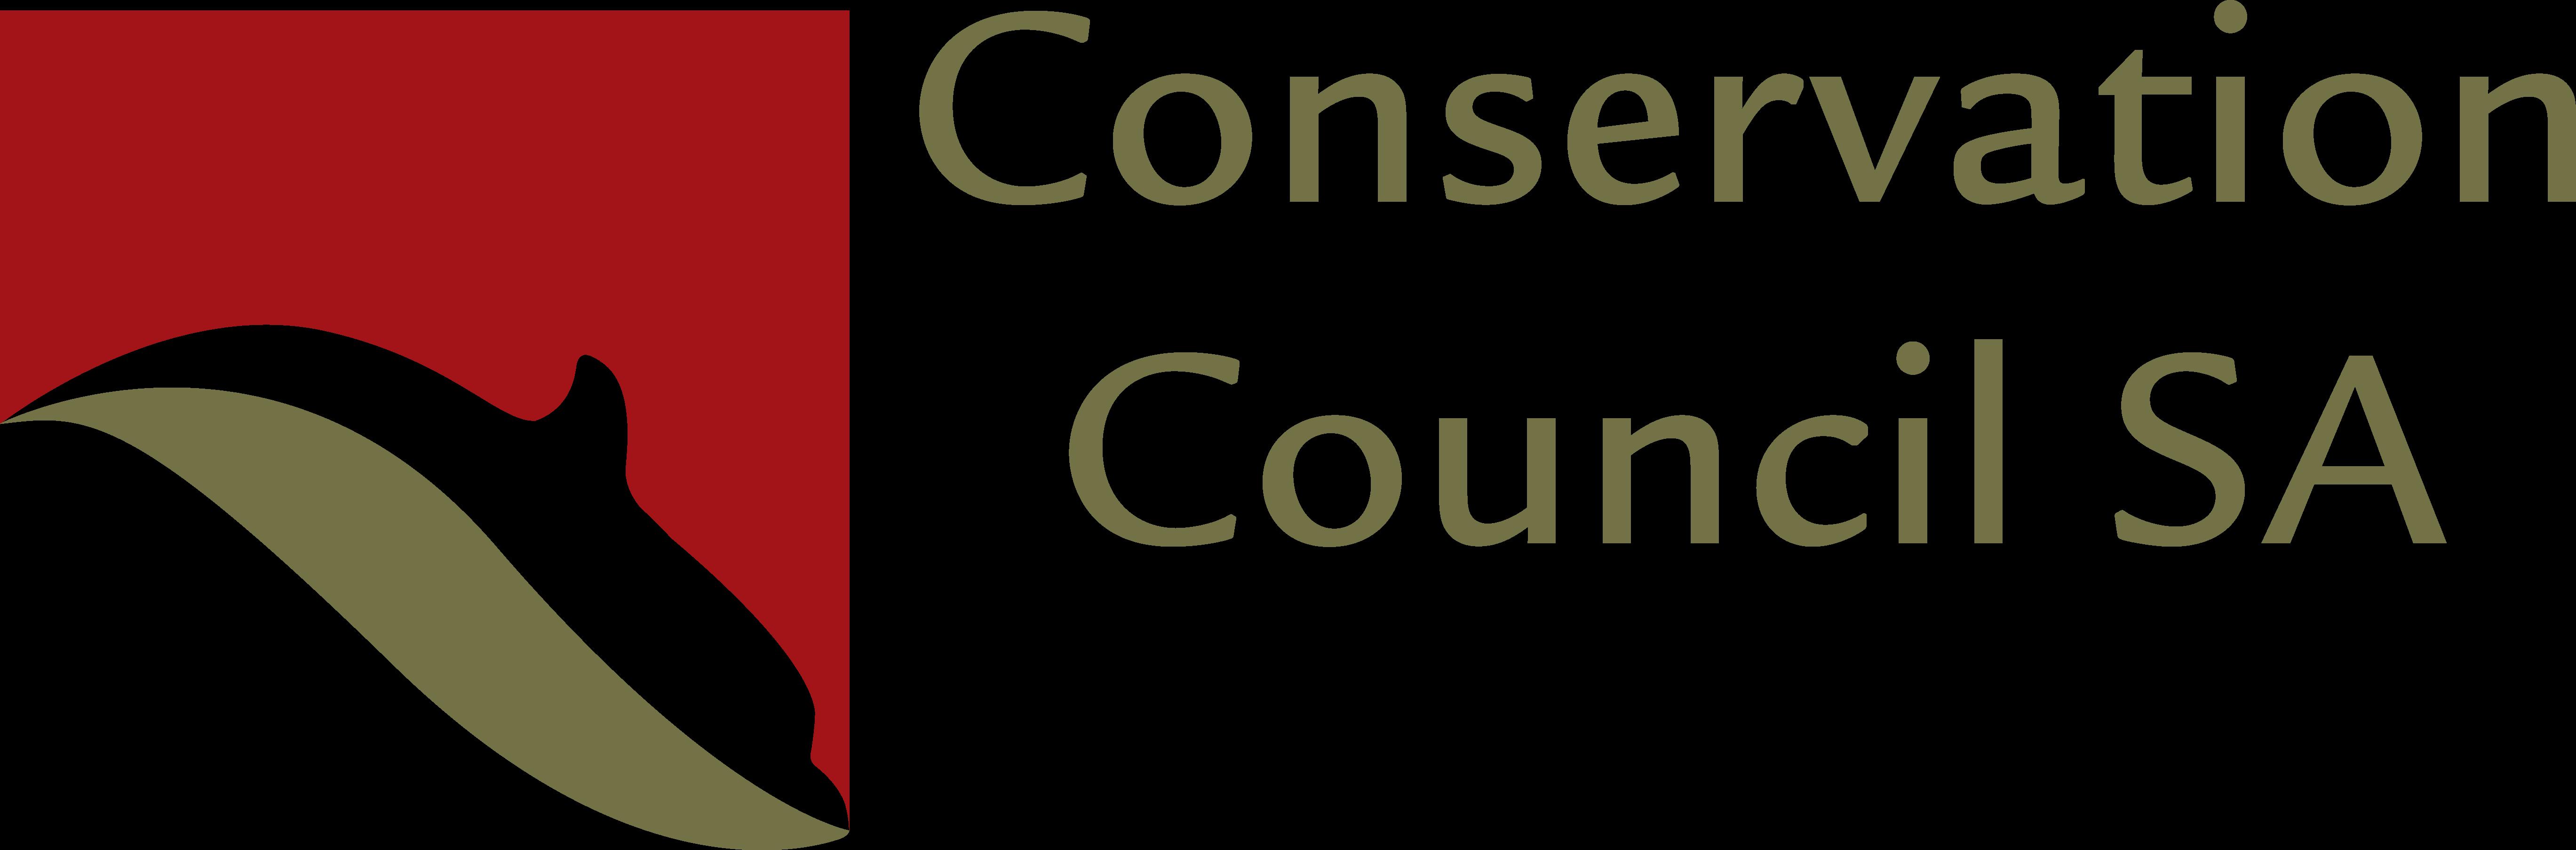 Conservation SA